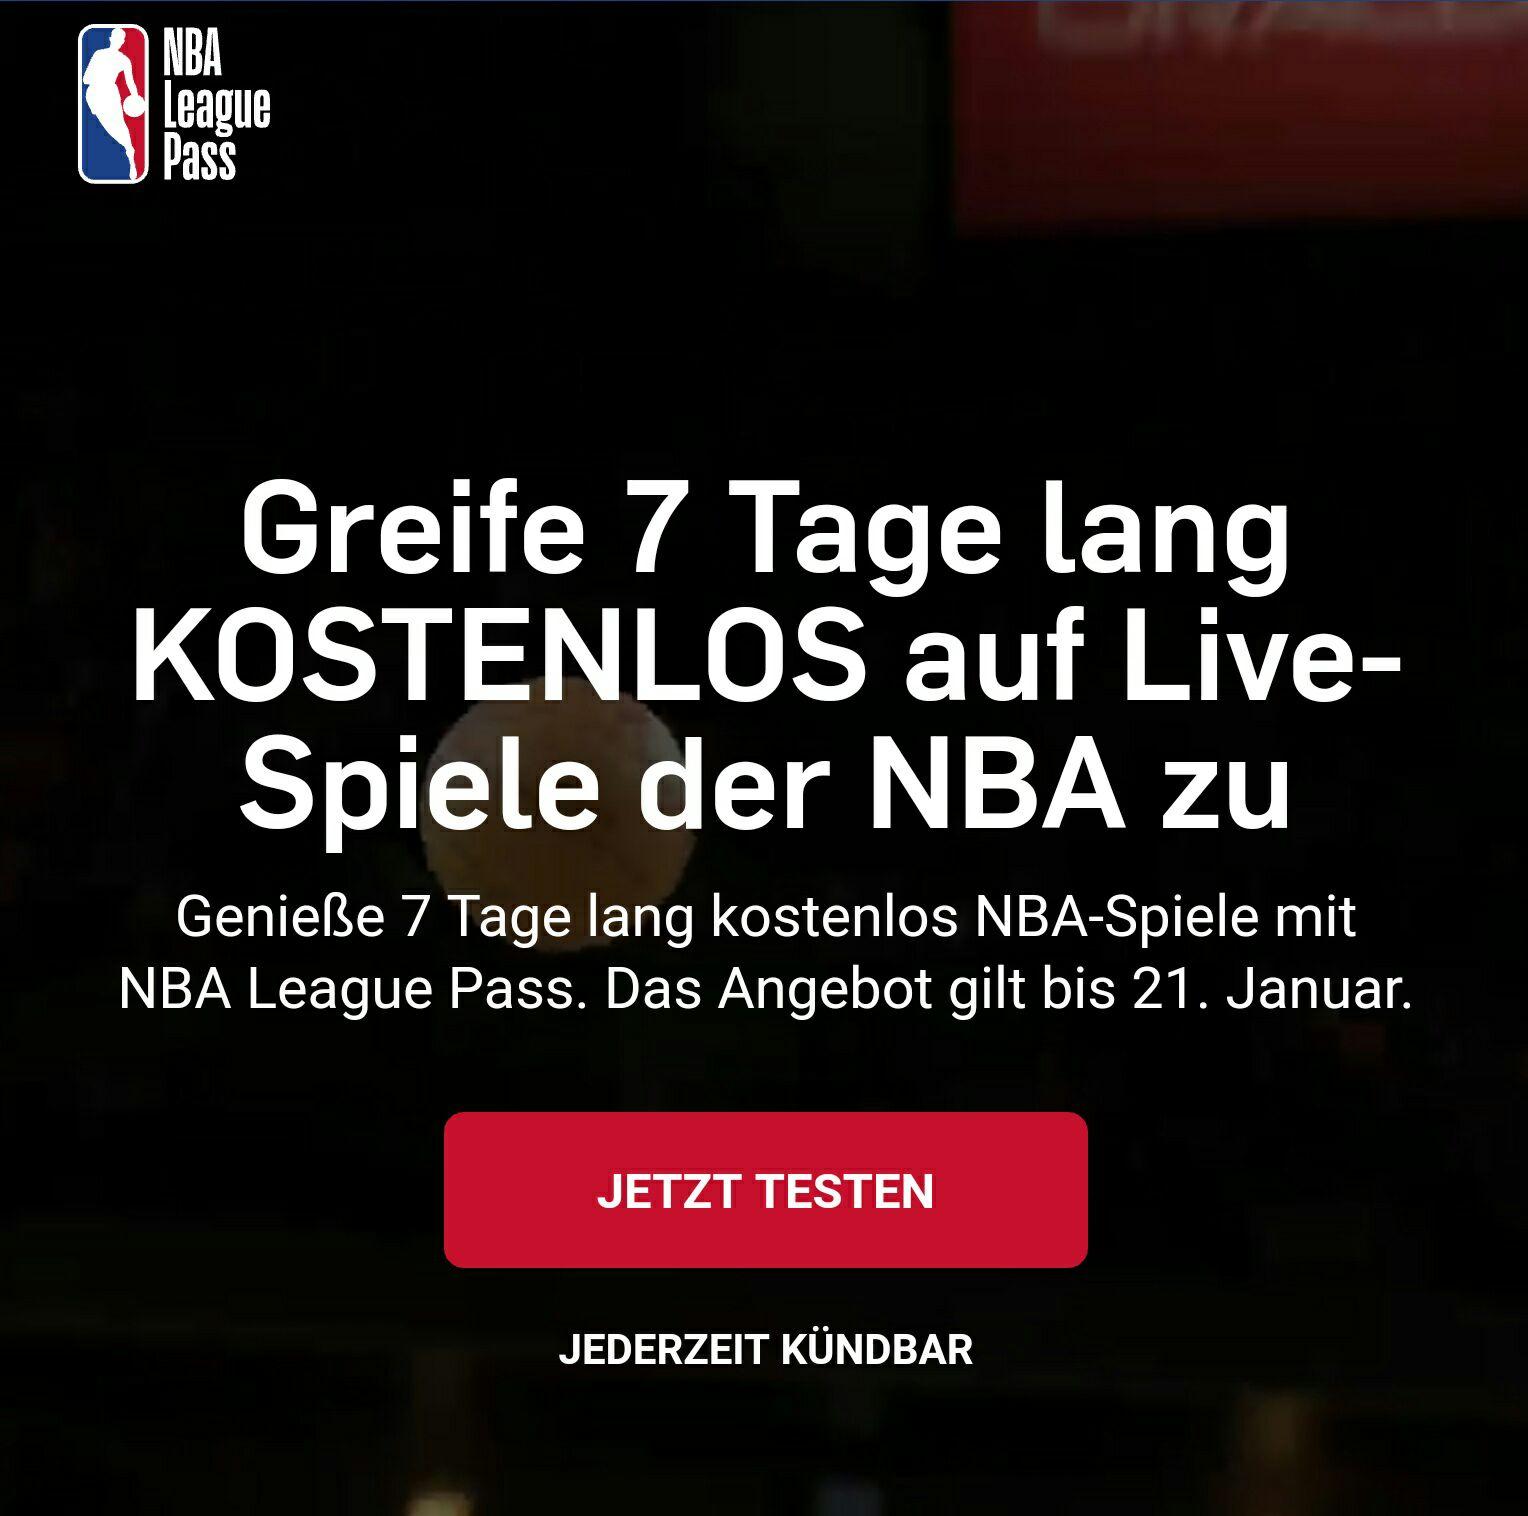 NBA League Pass - 7 Tage kostenlos - Kündigung notwendig